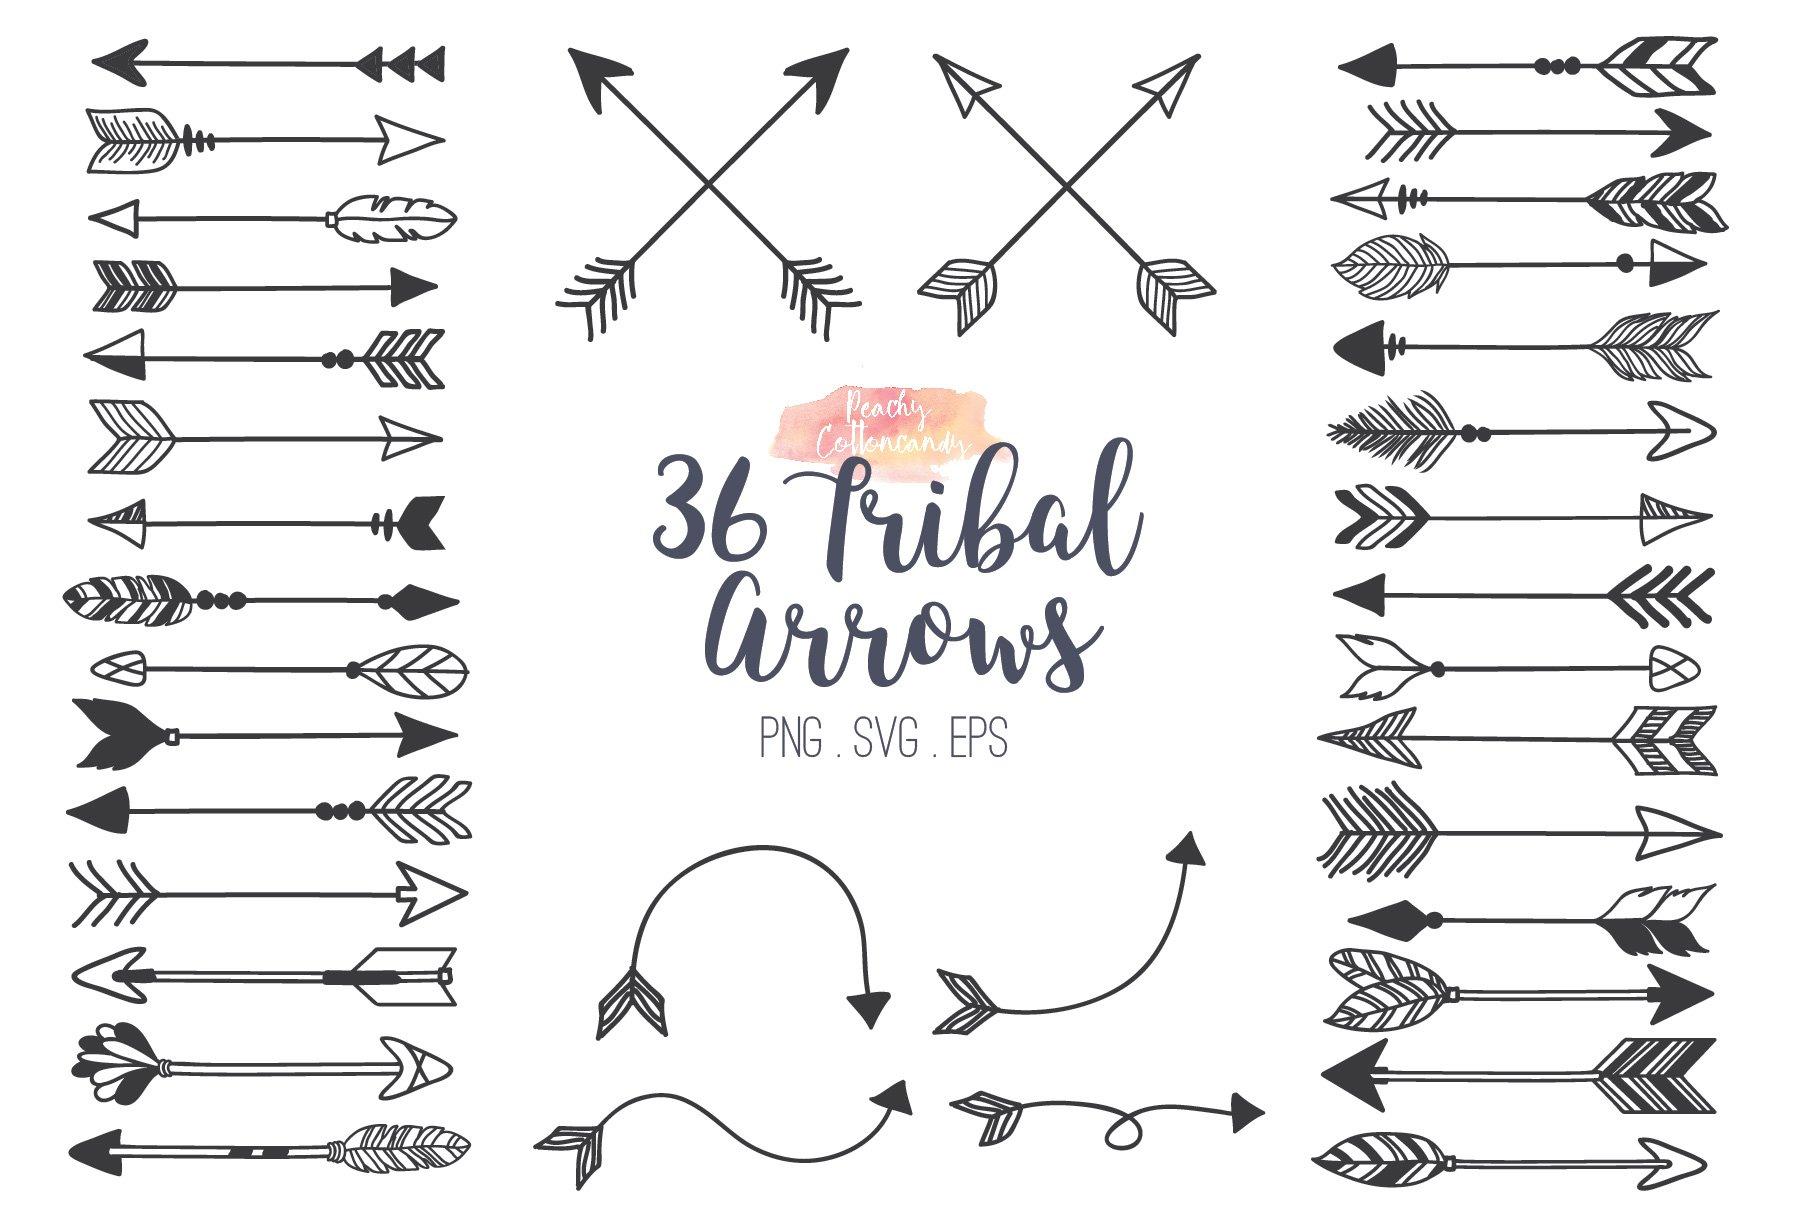 tribal arrows clipart illustrations creative market